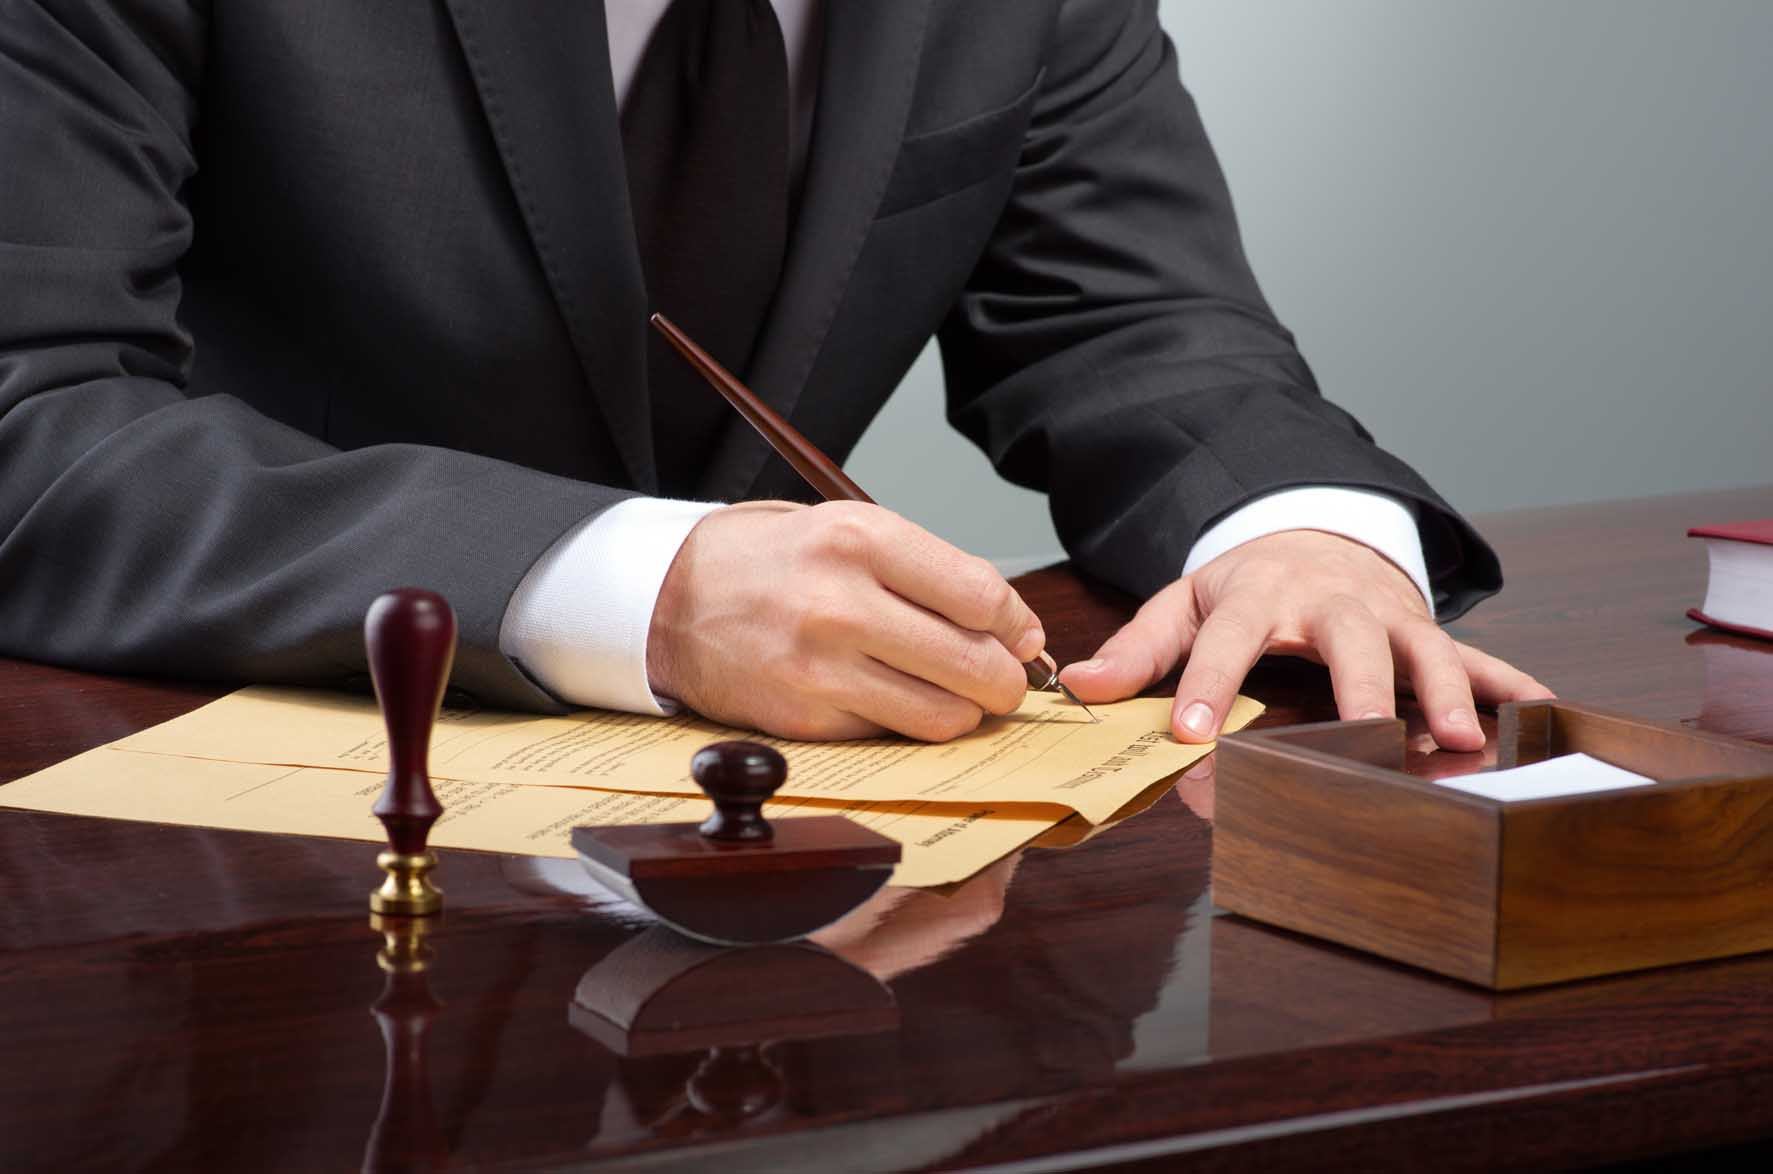 Quota di eredità riservata ai legittimari e donazione indiretta. Azione di riduzione e collazione